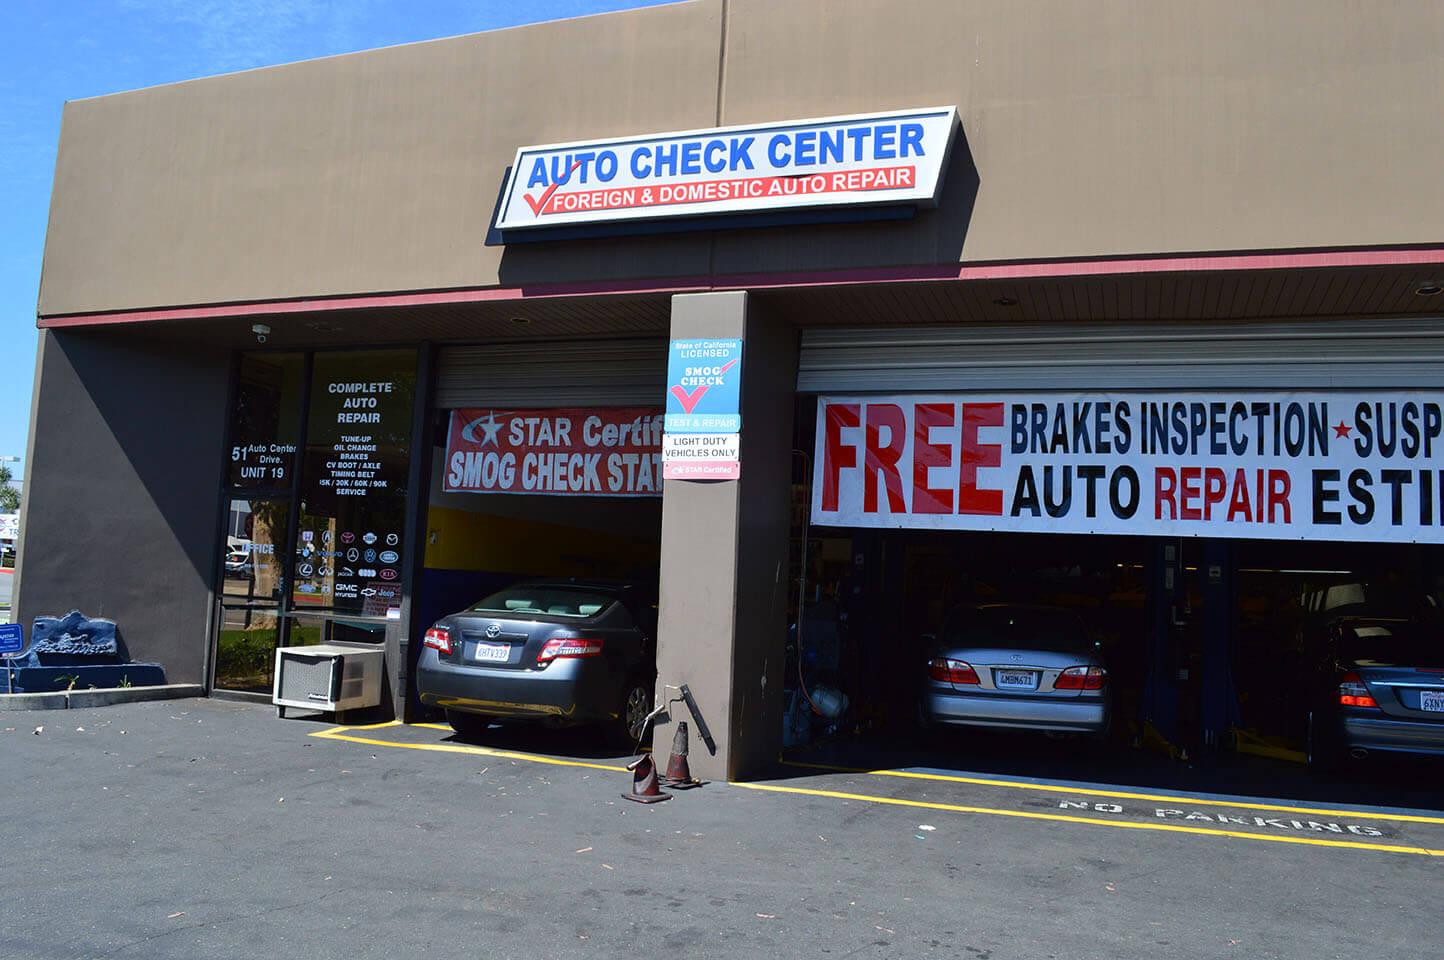 2975 Cheapest Smog Check In Irvine Free Retest Gmc Timing Belt Auto Repair 92618